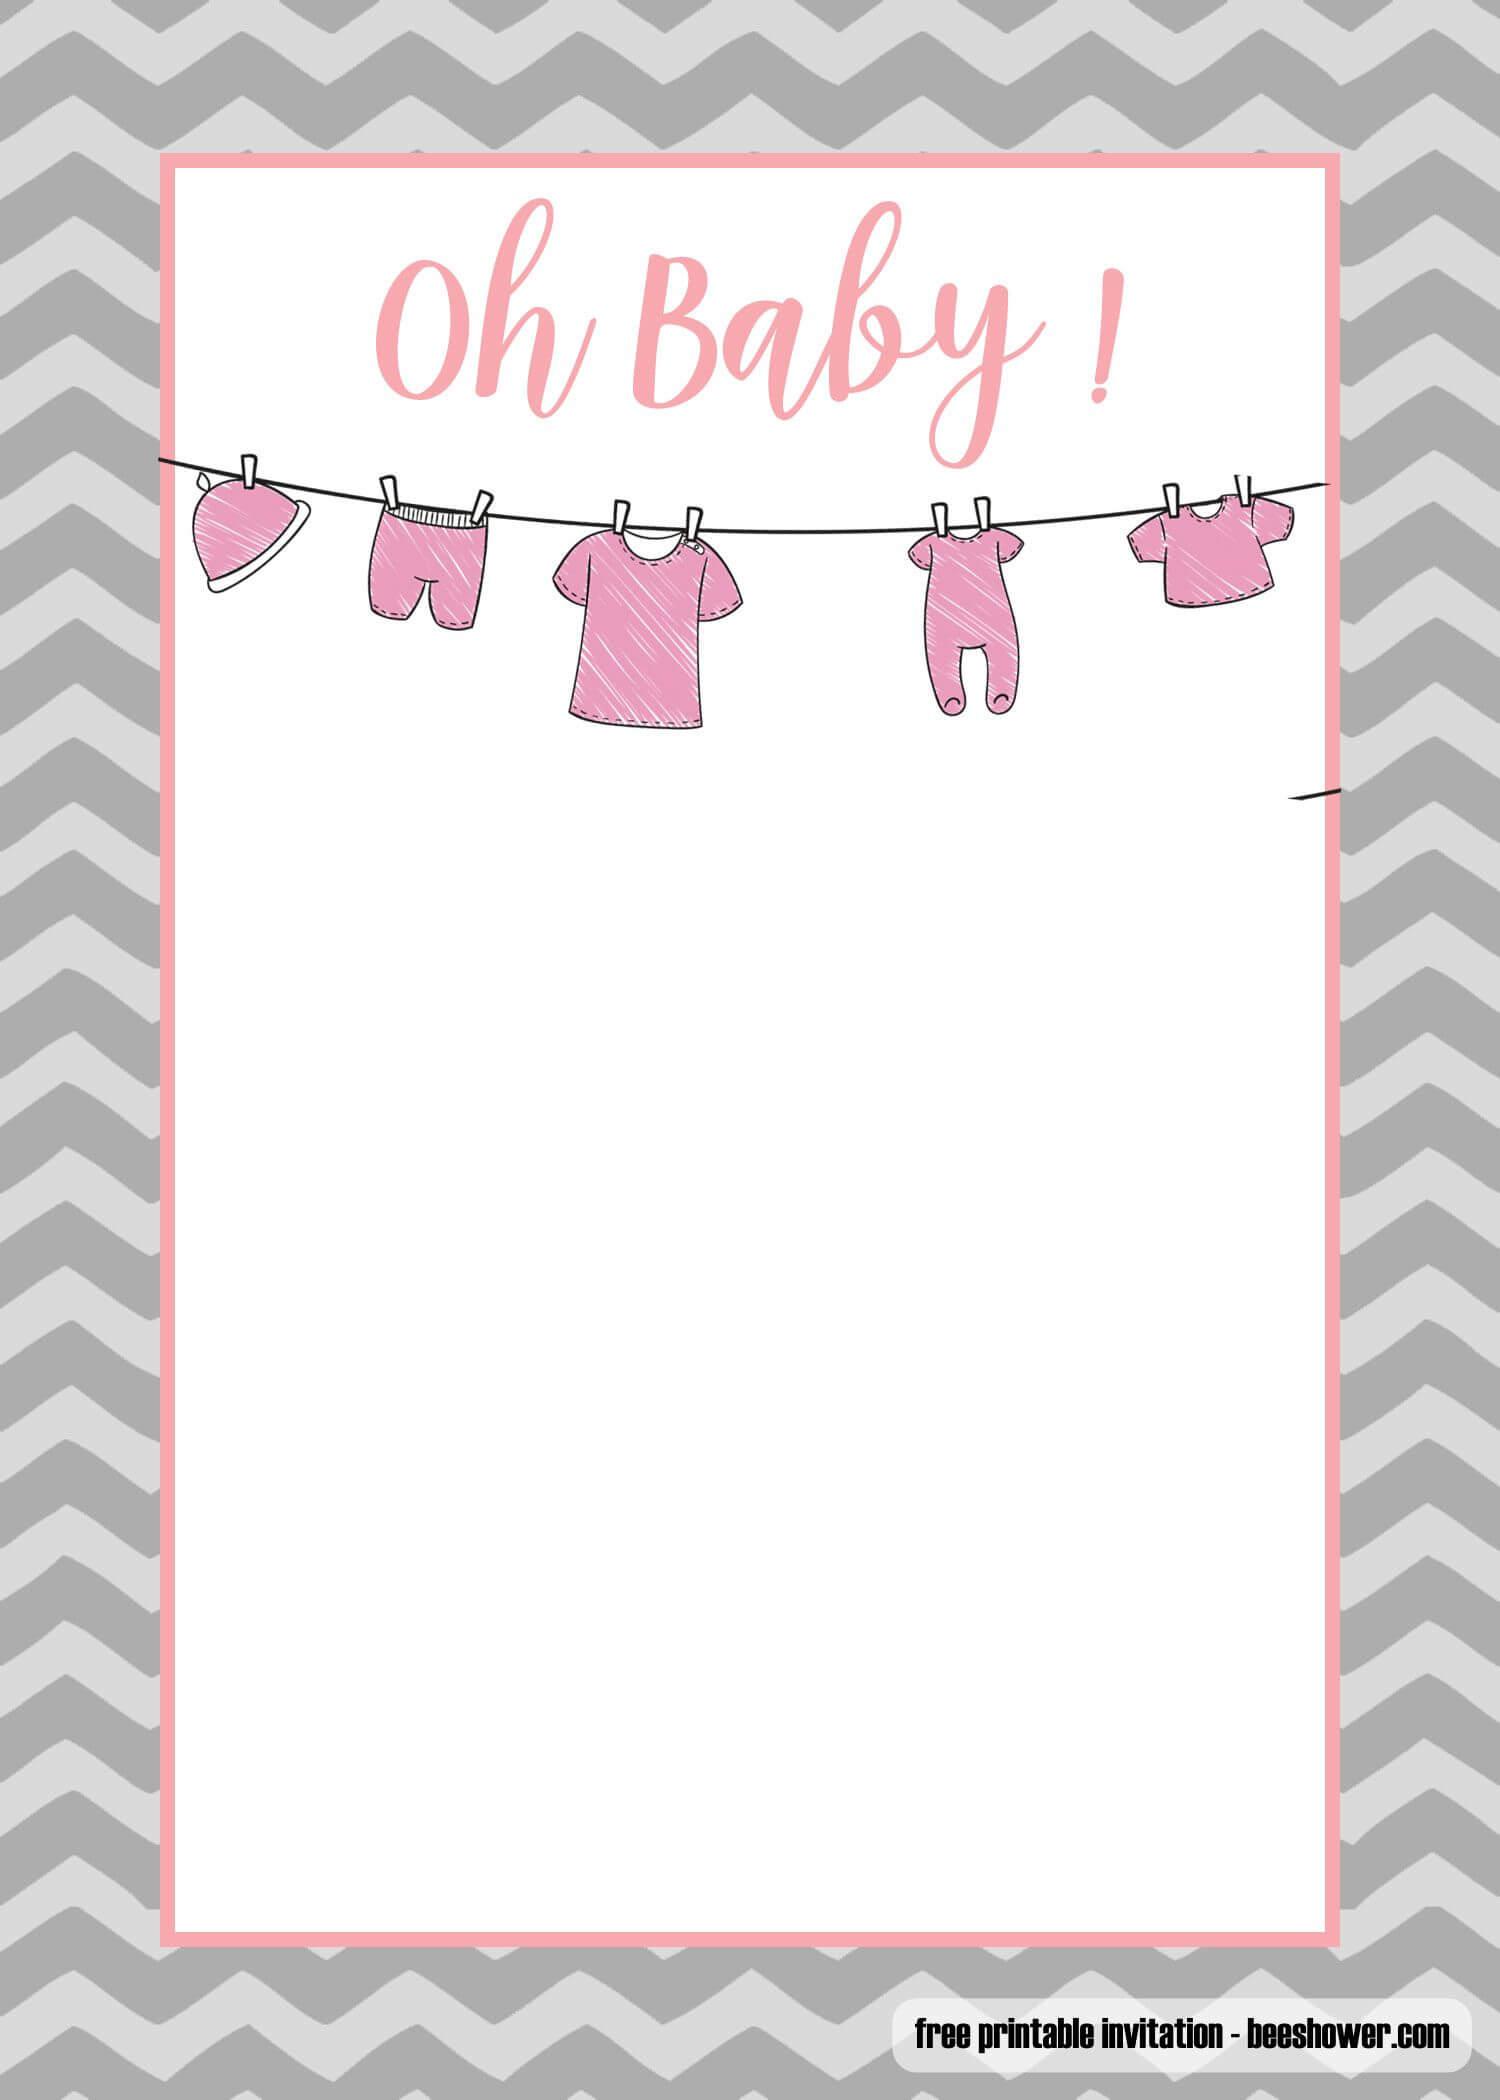 Free Printable Onesie Baby Shower Invitations Templates Within Free Baby Shower Invitation Templates Microsoft Word